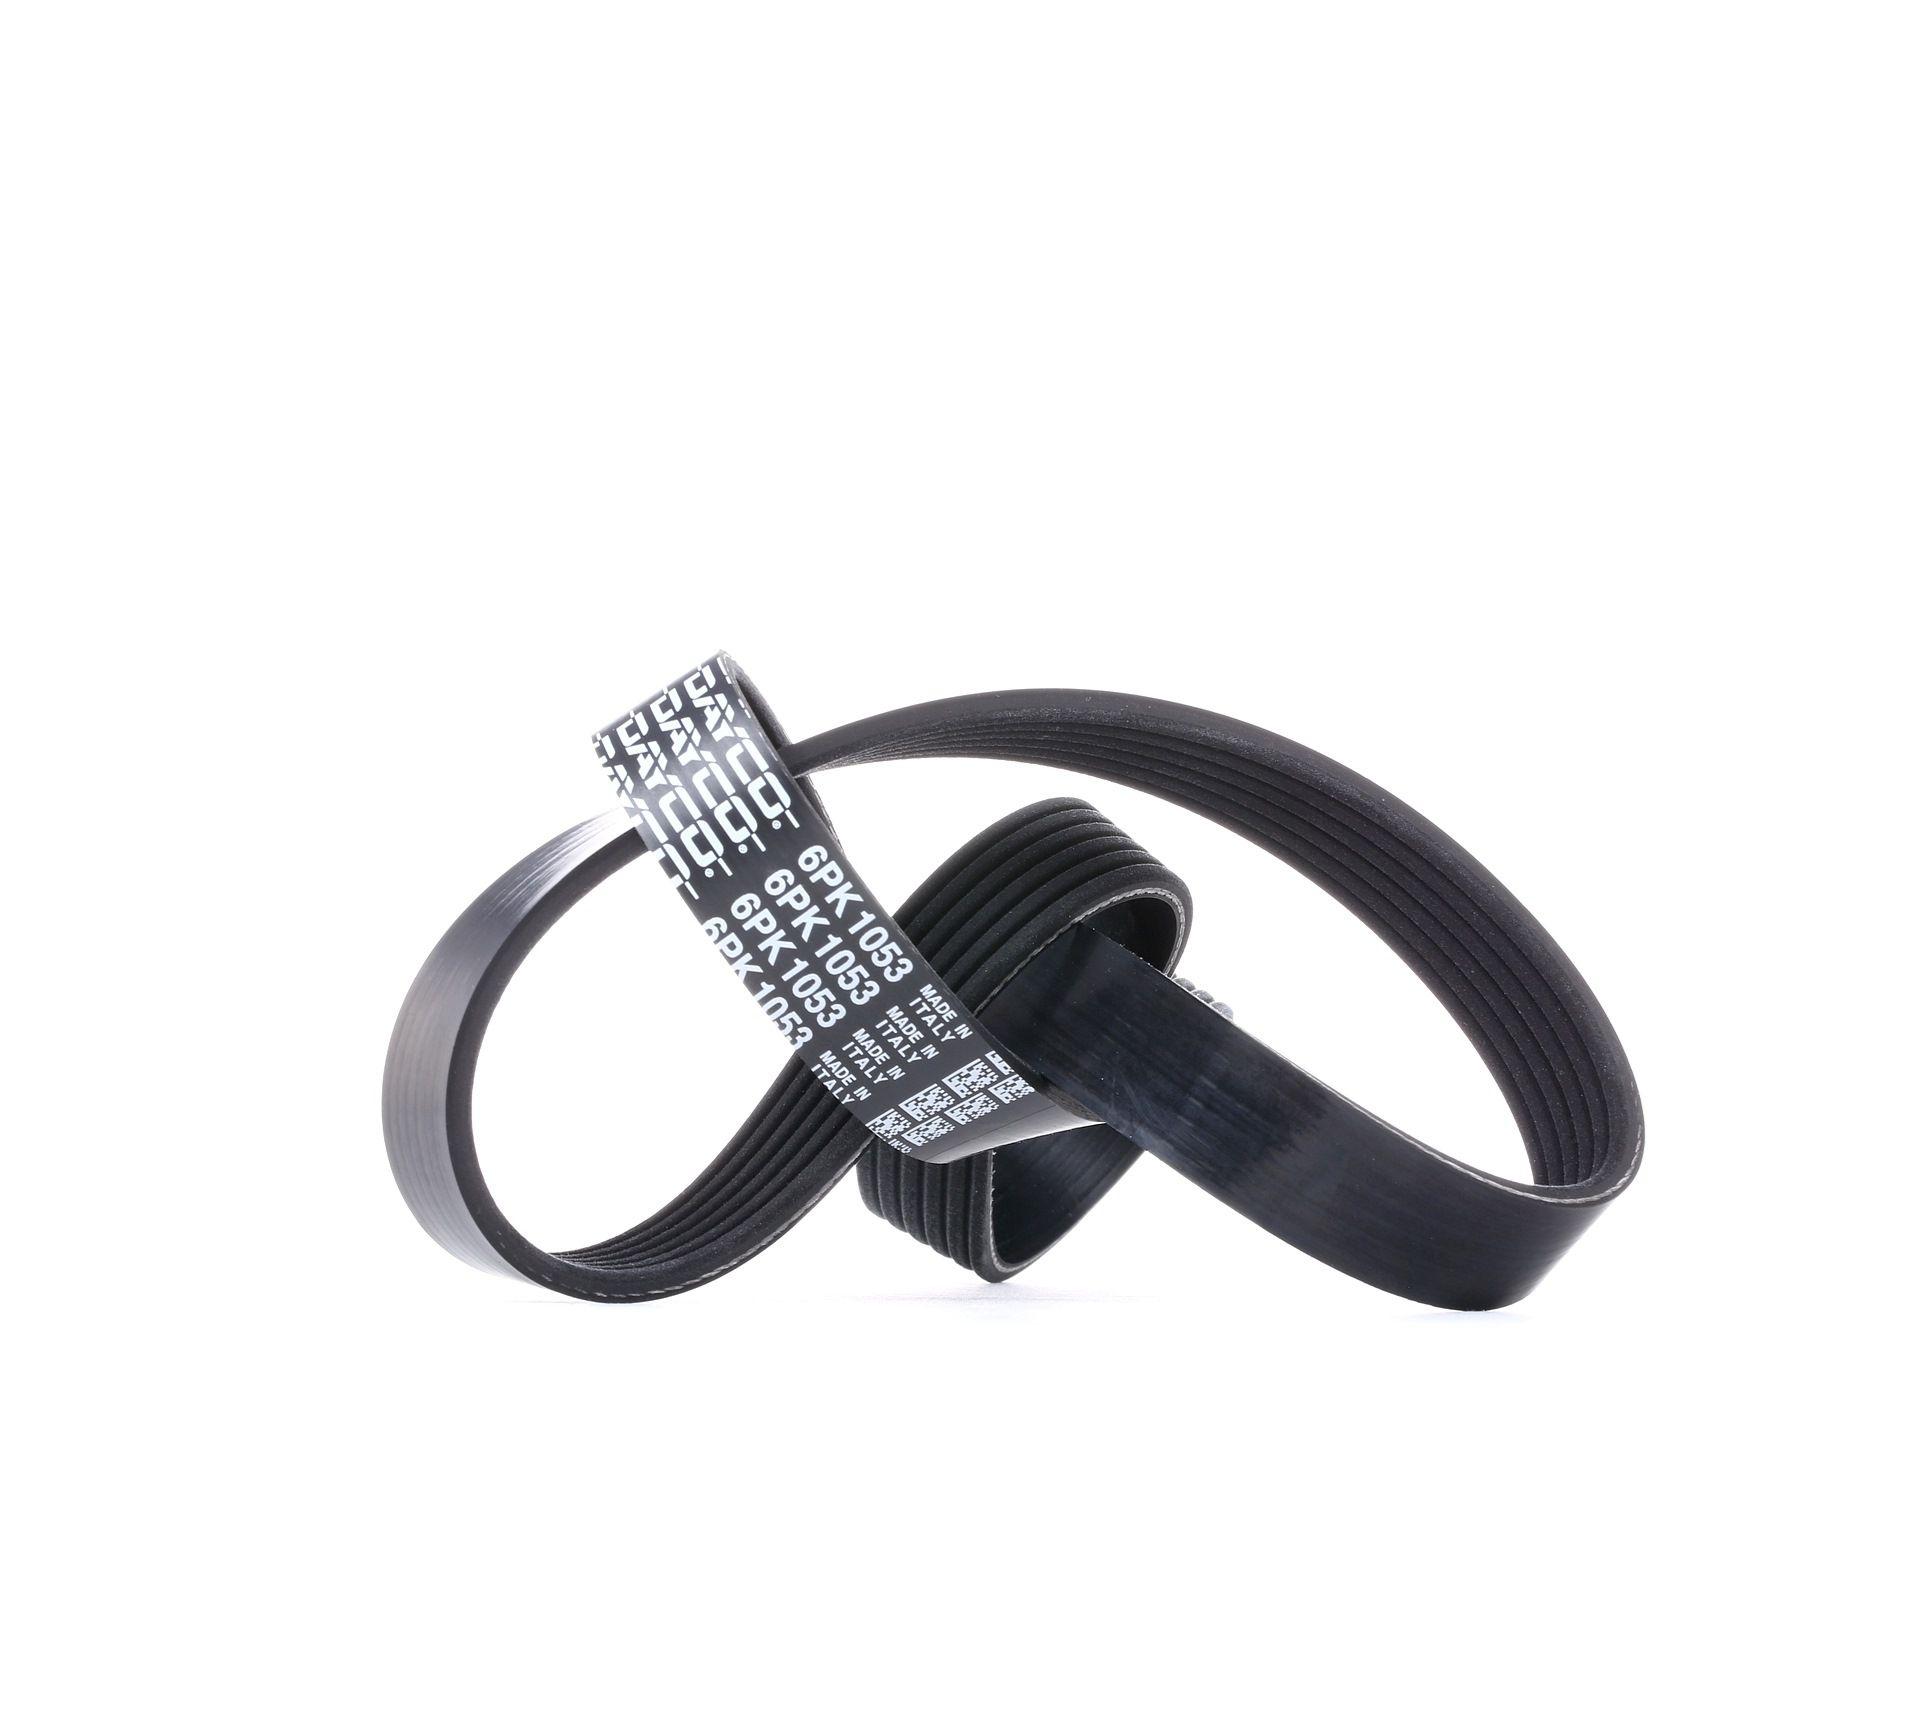 Ribbed Belt DAYCO 6PK1053 rating